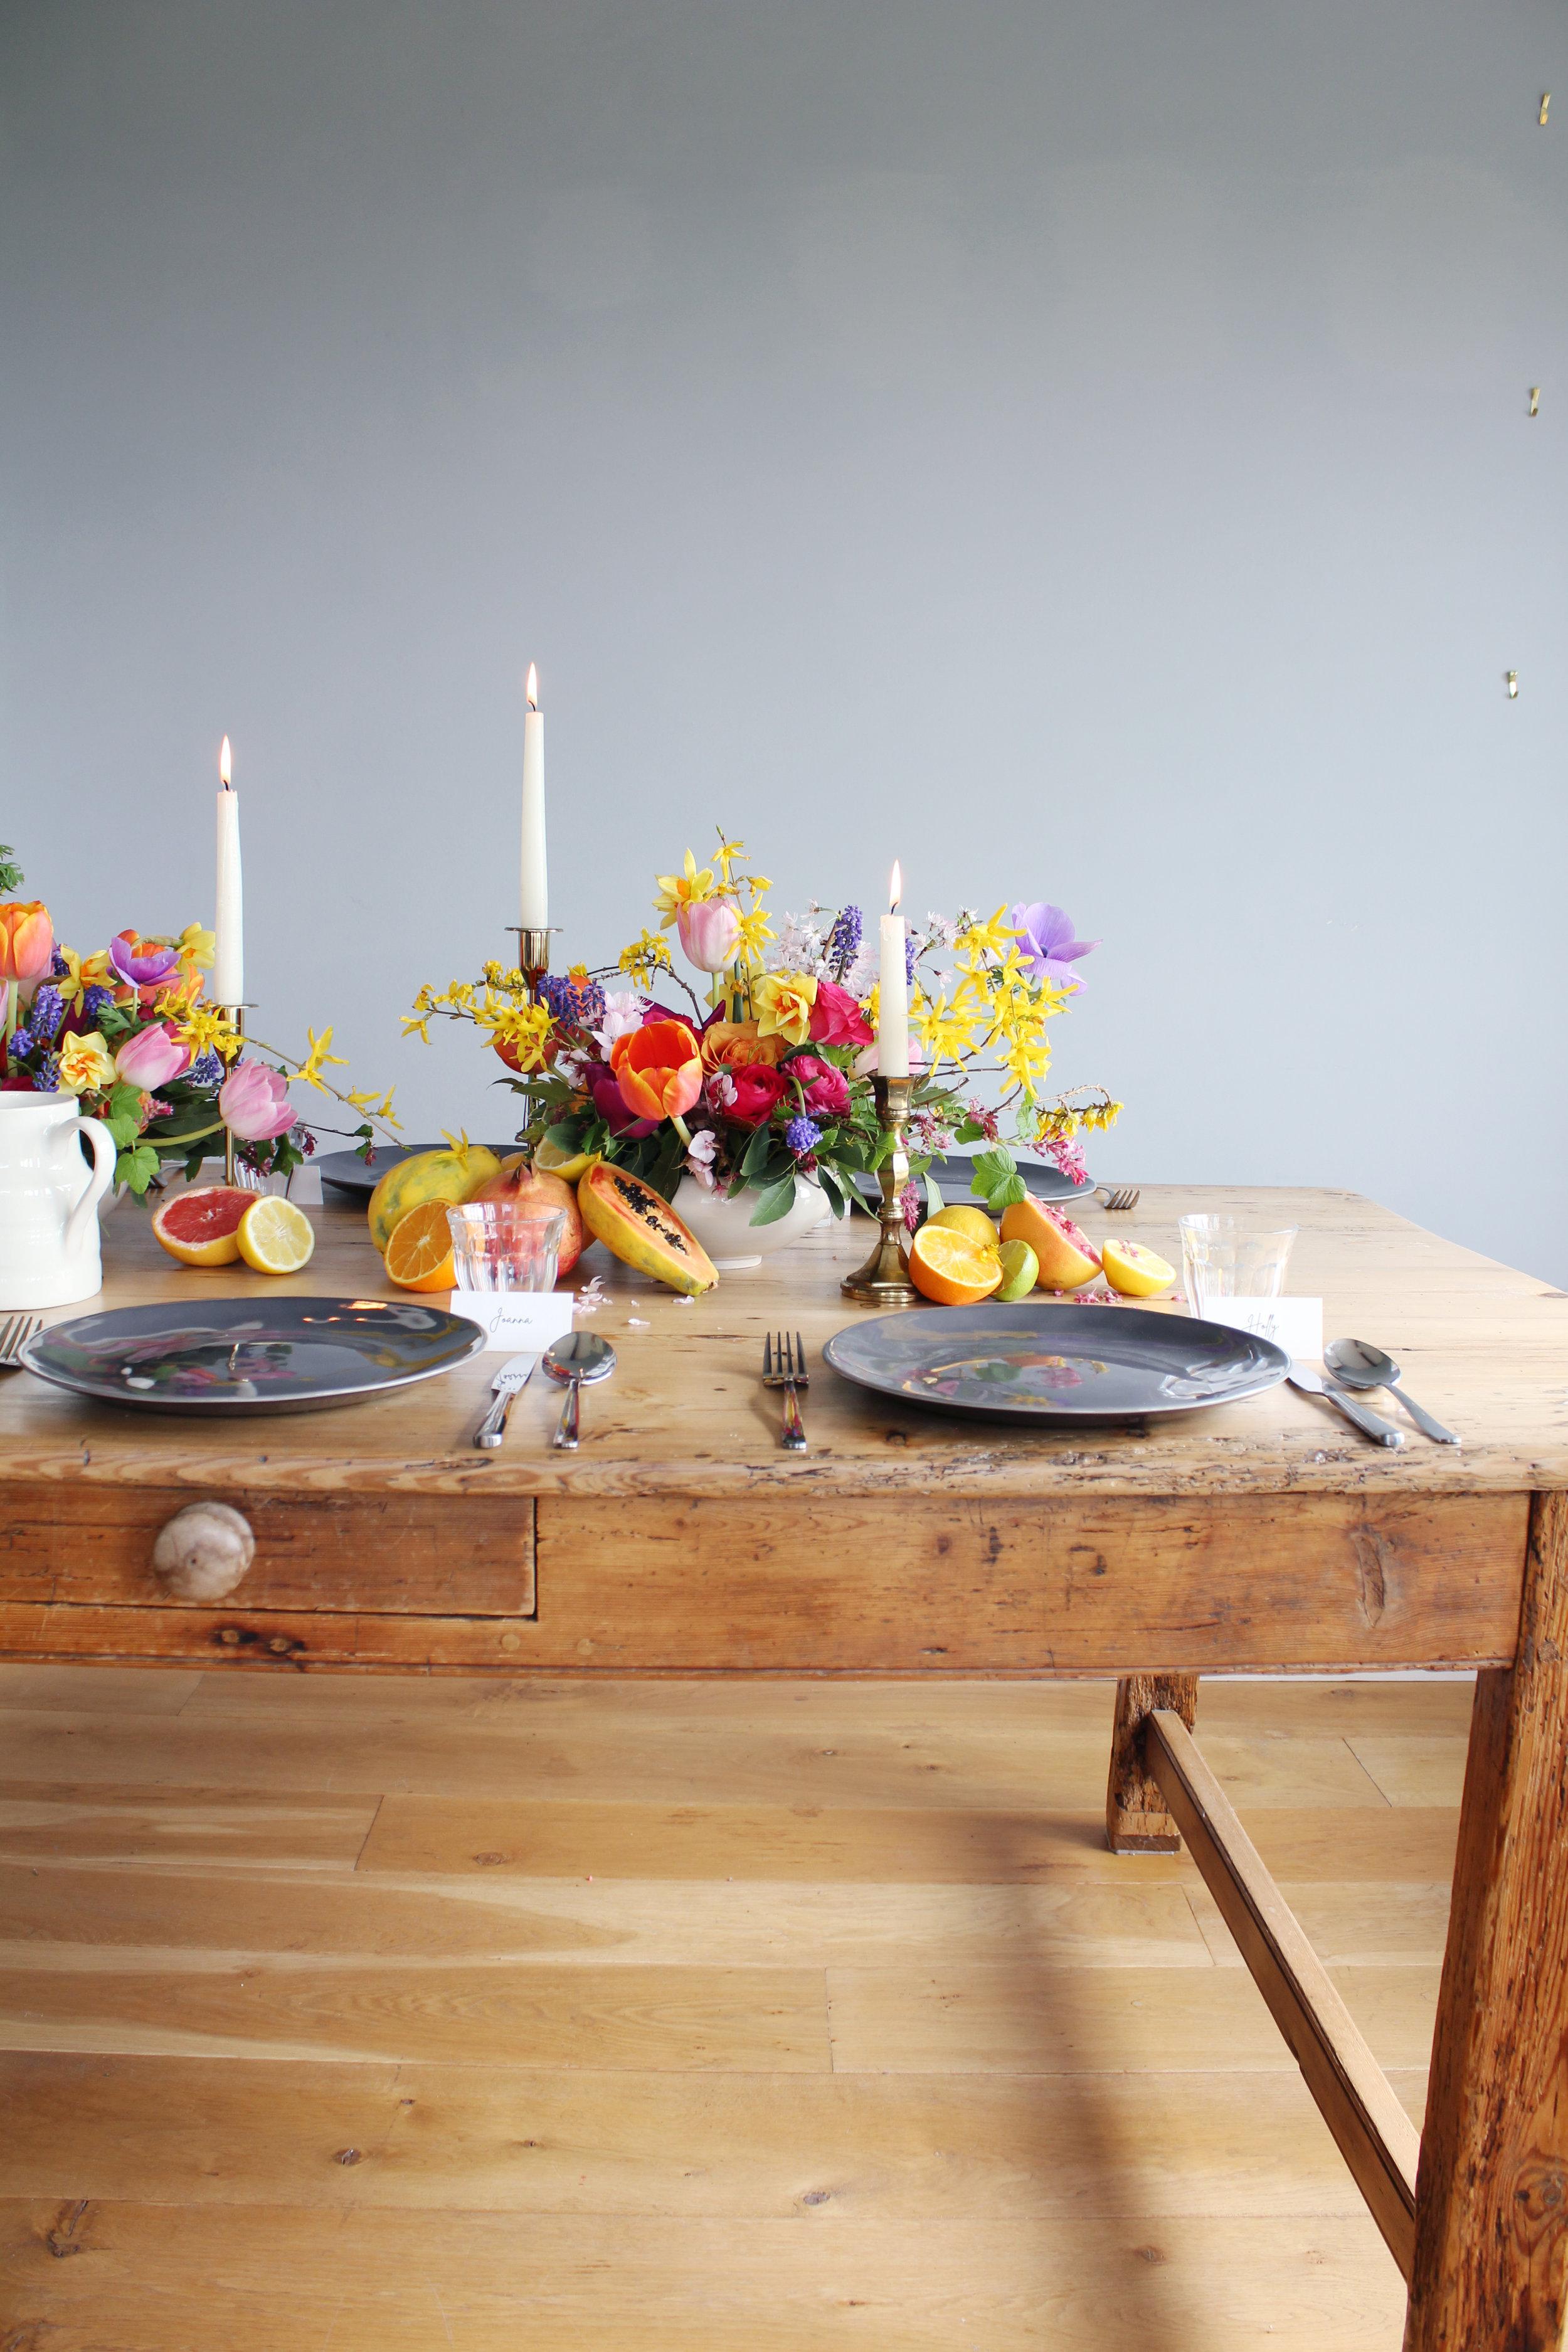 Callie-Pettigrew-Fruity-Florals-25.jpg